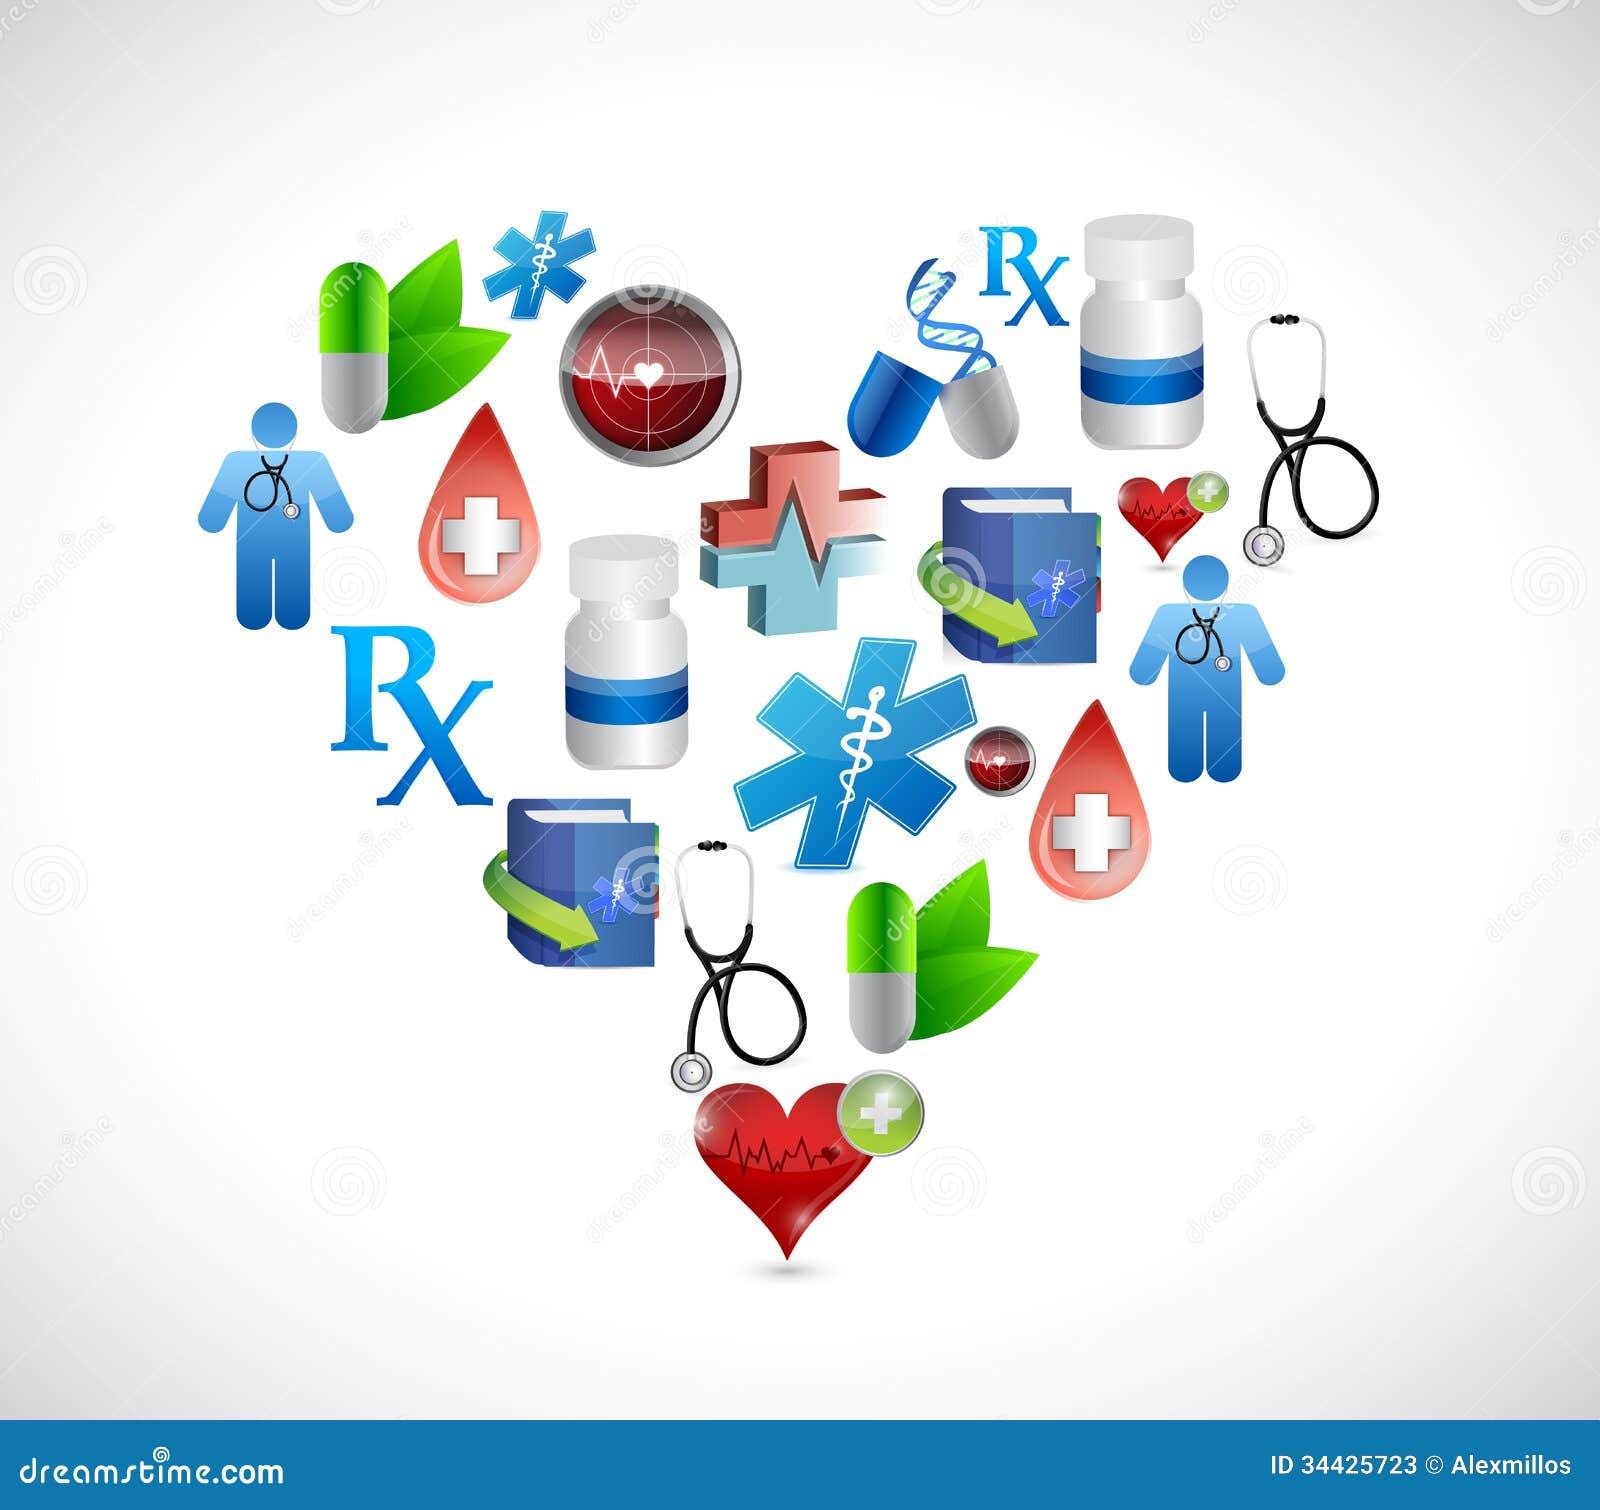 Heart Medical Icons Illustration Design Graphics Stock ...